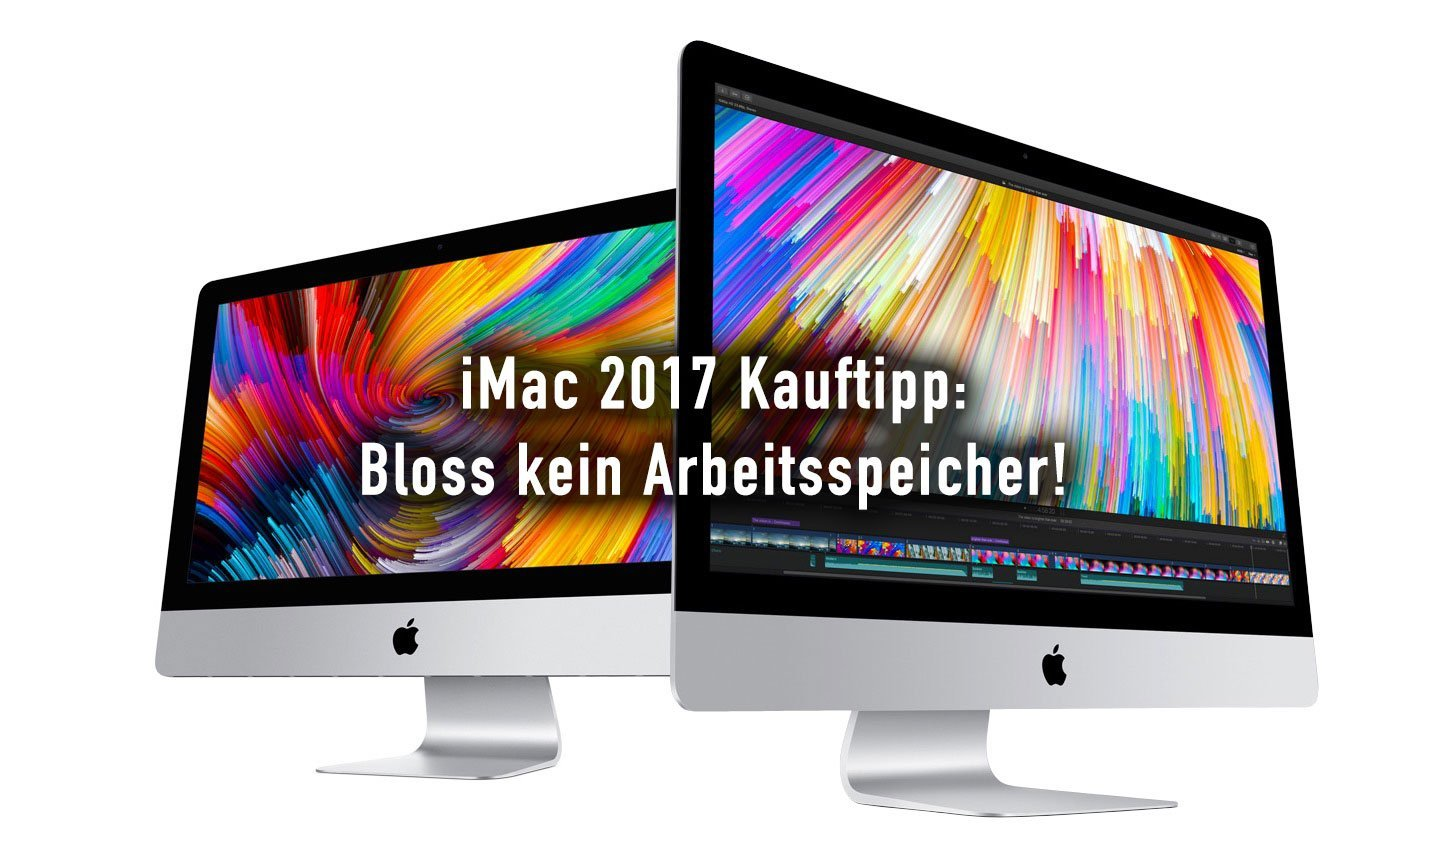 iMac 2017 Kauf-Beratung: 27 Zoll Retina 5K, Minimum-RAM, SSD! 1